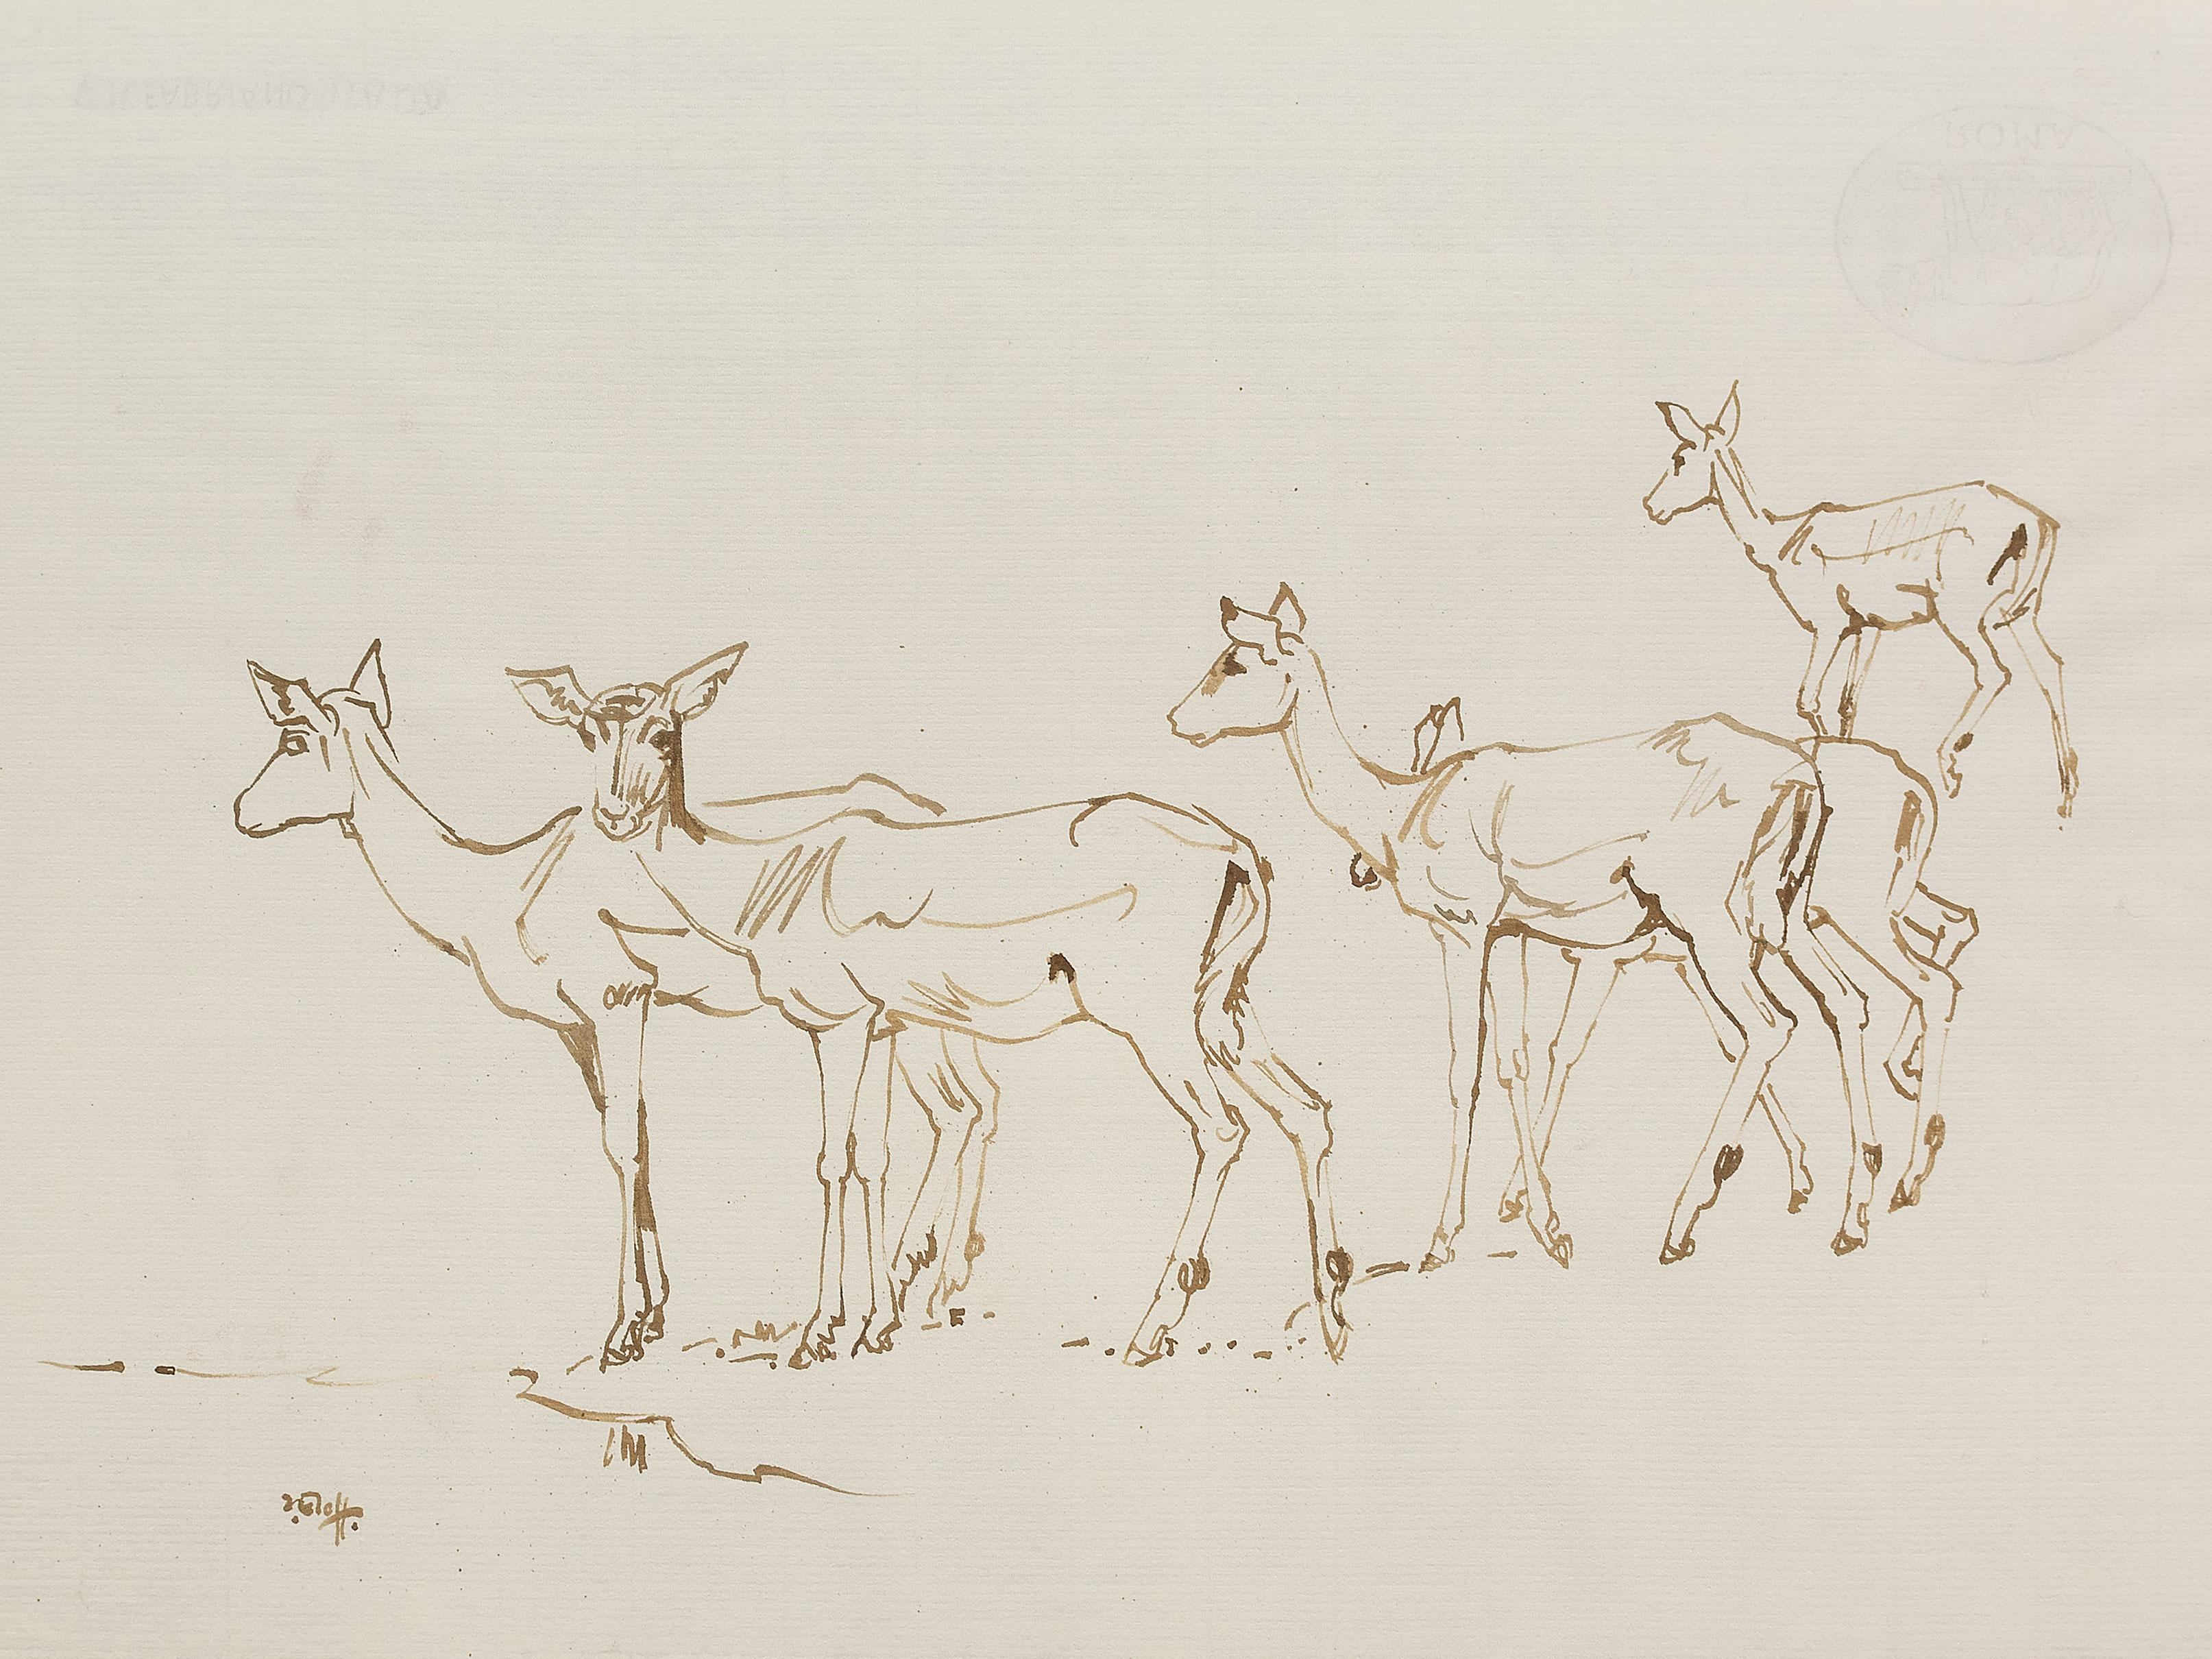 Zakkie Eloff (SA 1925 - 2004) Watercolour, Impala, Signed, 49 x 66